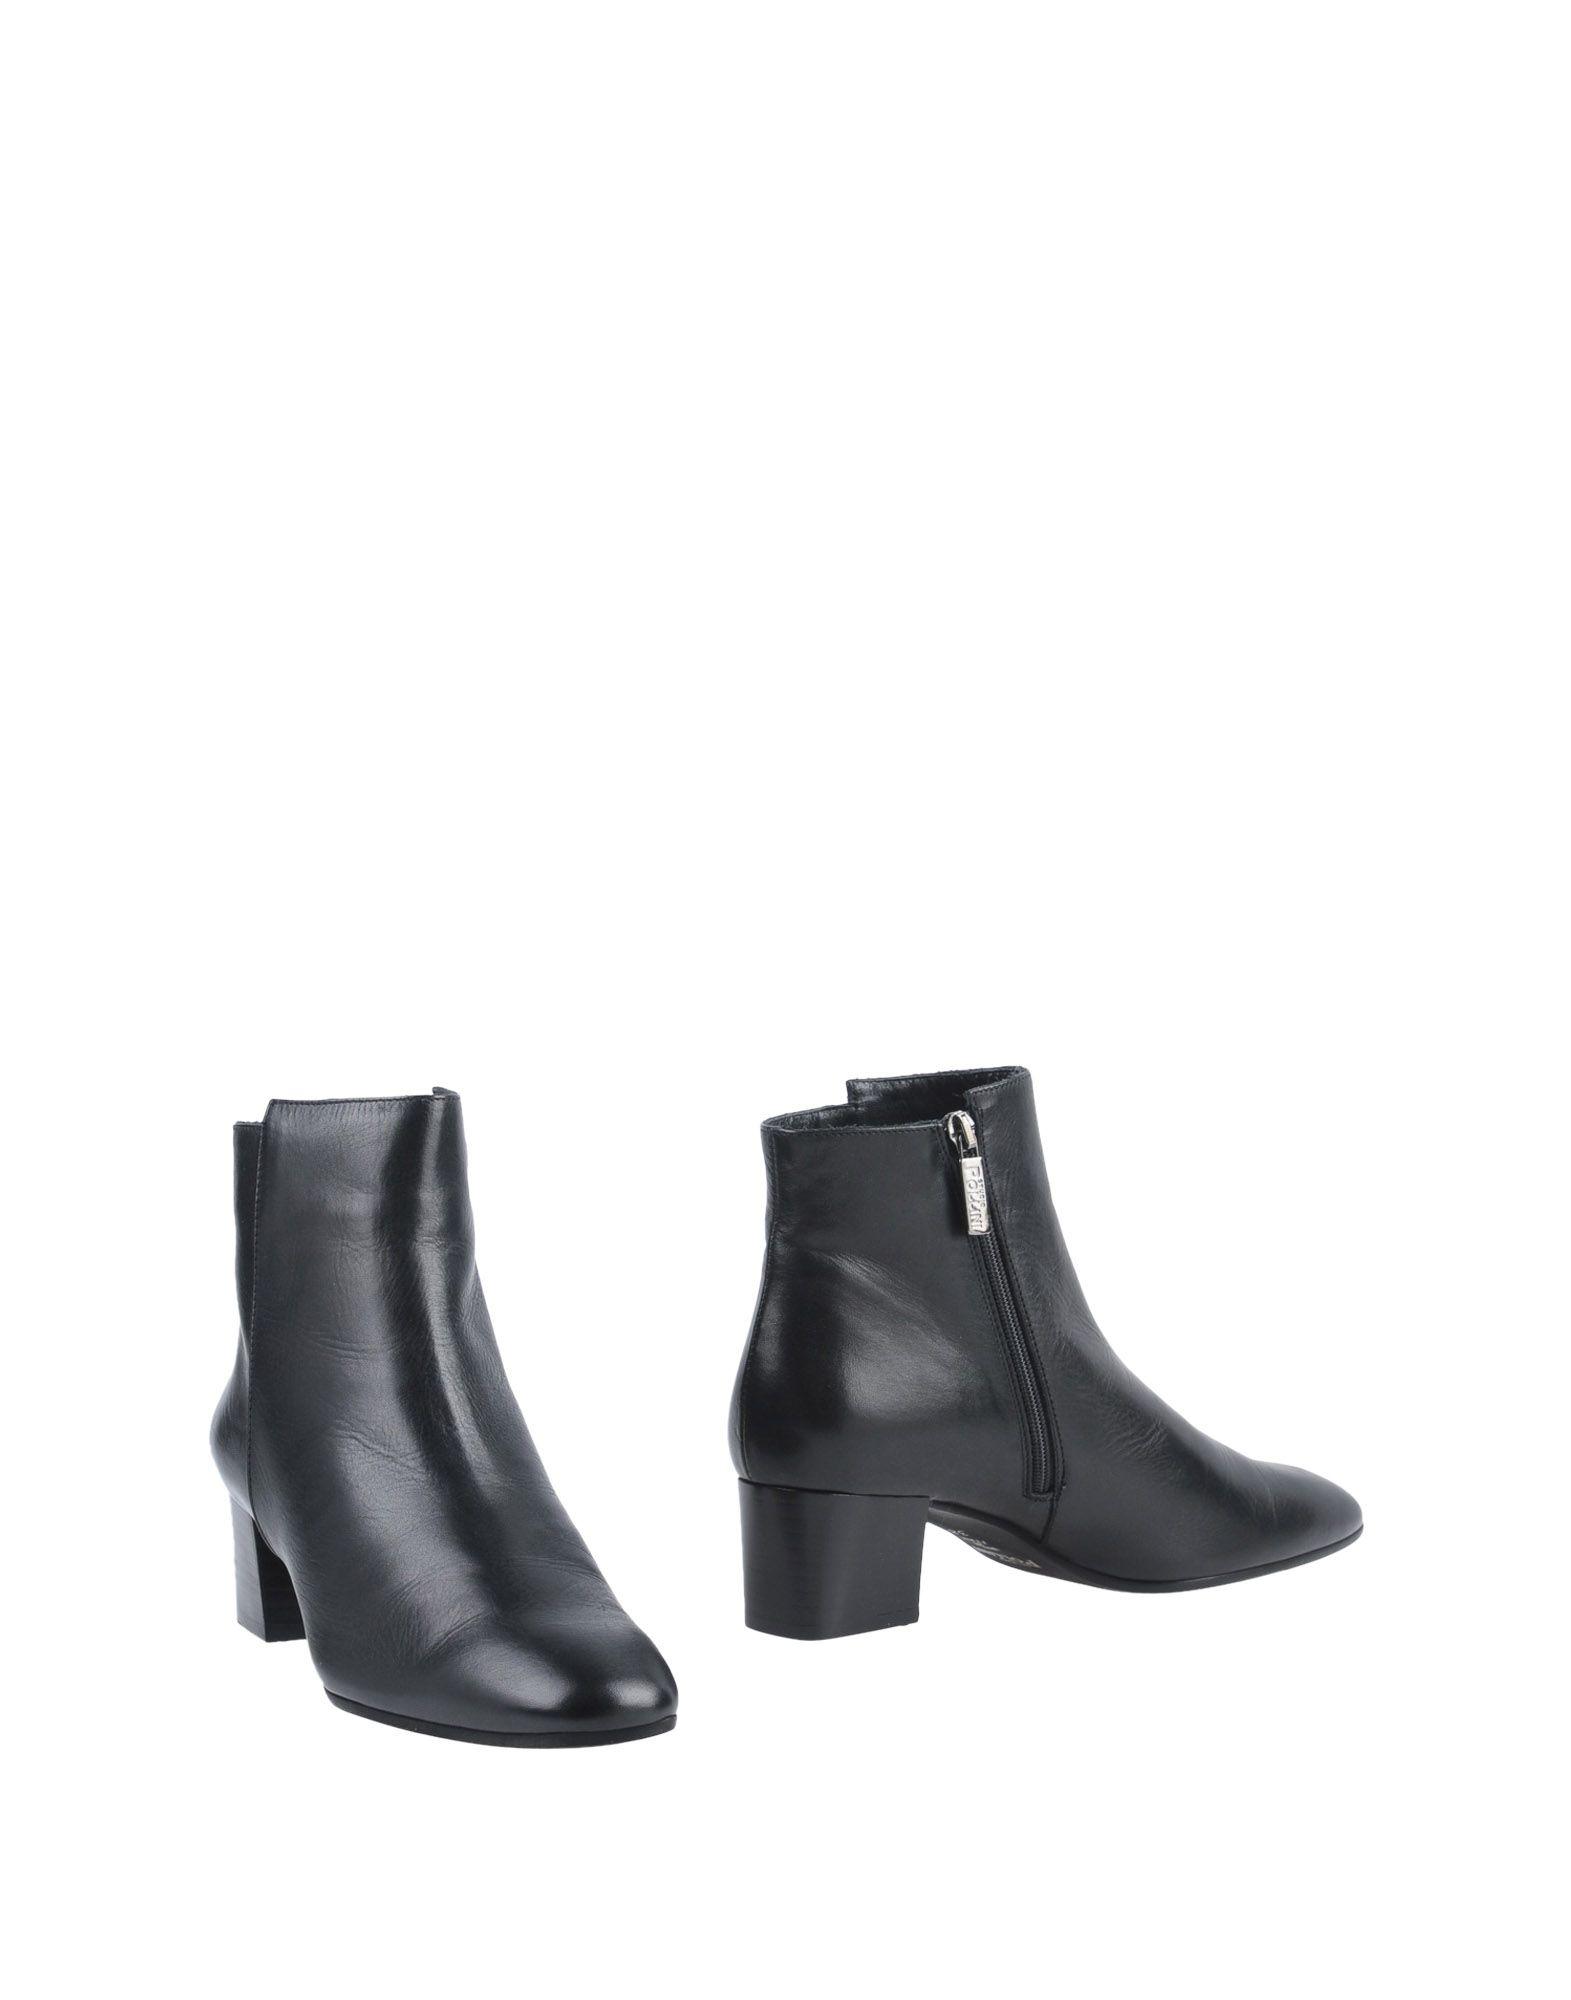 Studio Pollini Stiefelette Damen  11313463RS Schuhe Gute Qualität beliebte Schuhe 11313463RS 2ec7c6